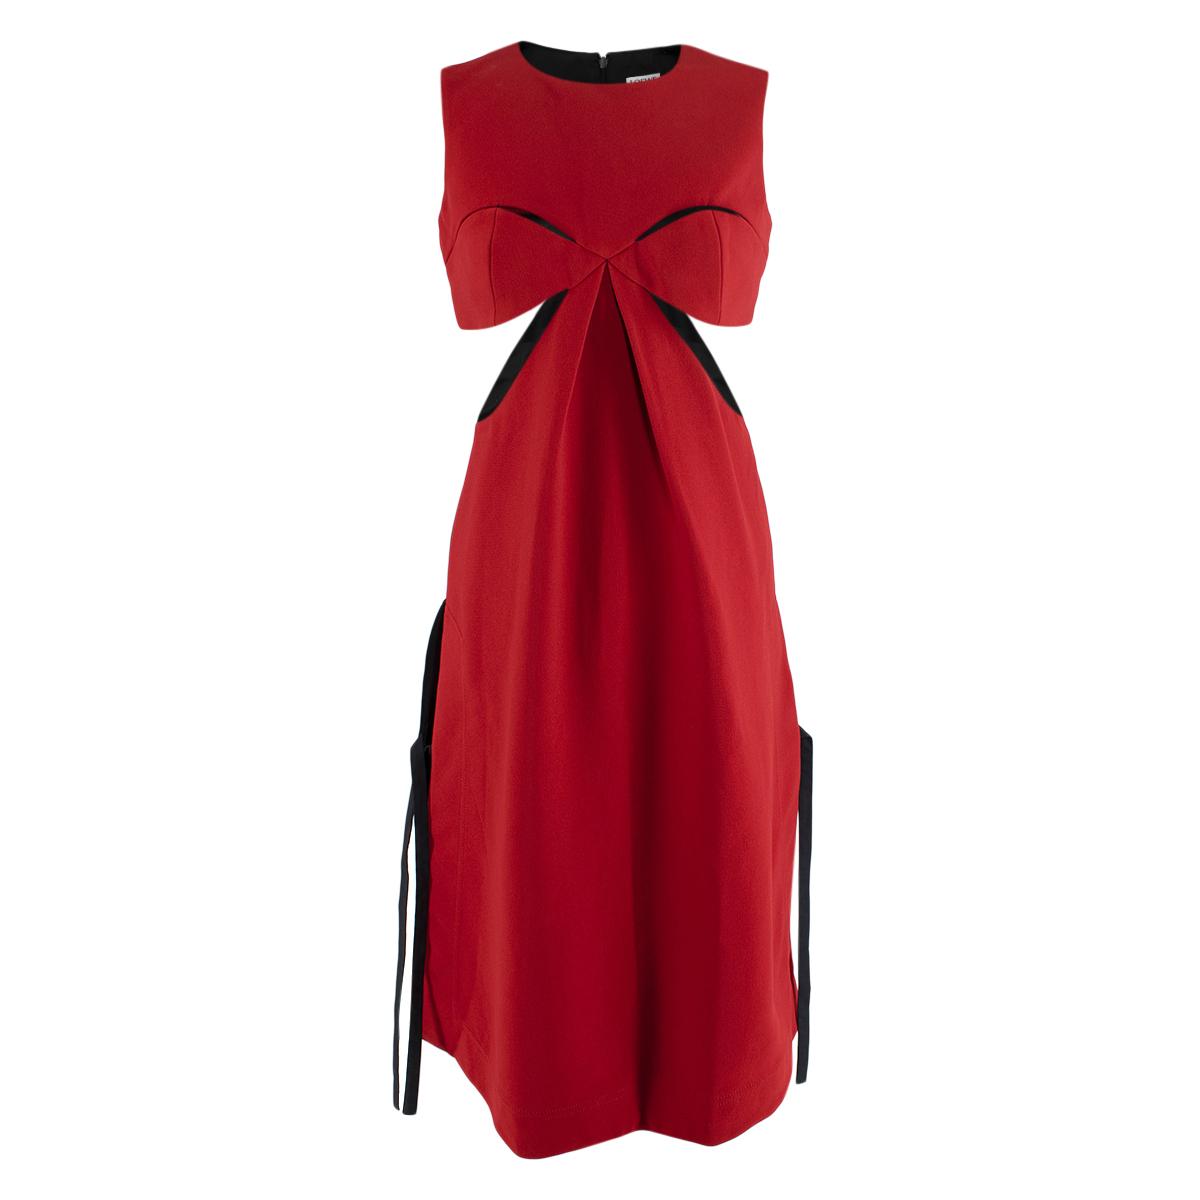 Loewe Red & Black Tie Detail Cut-Out Sleeveless Dress